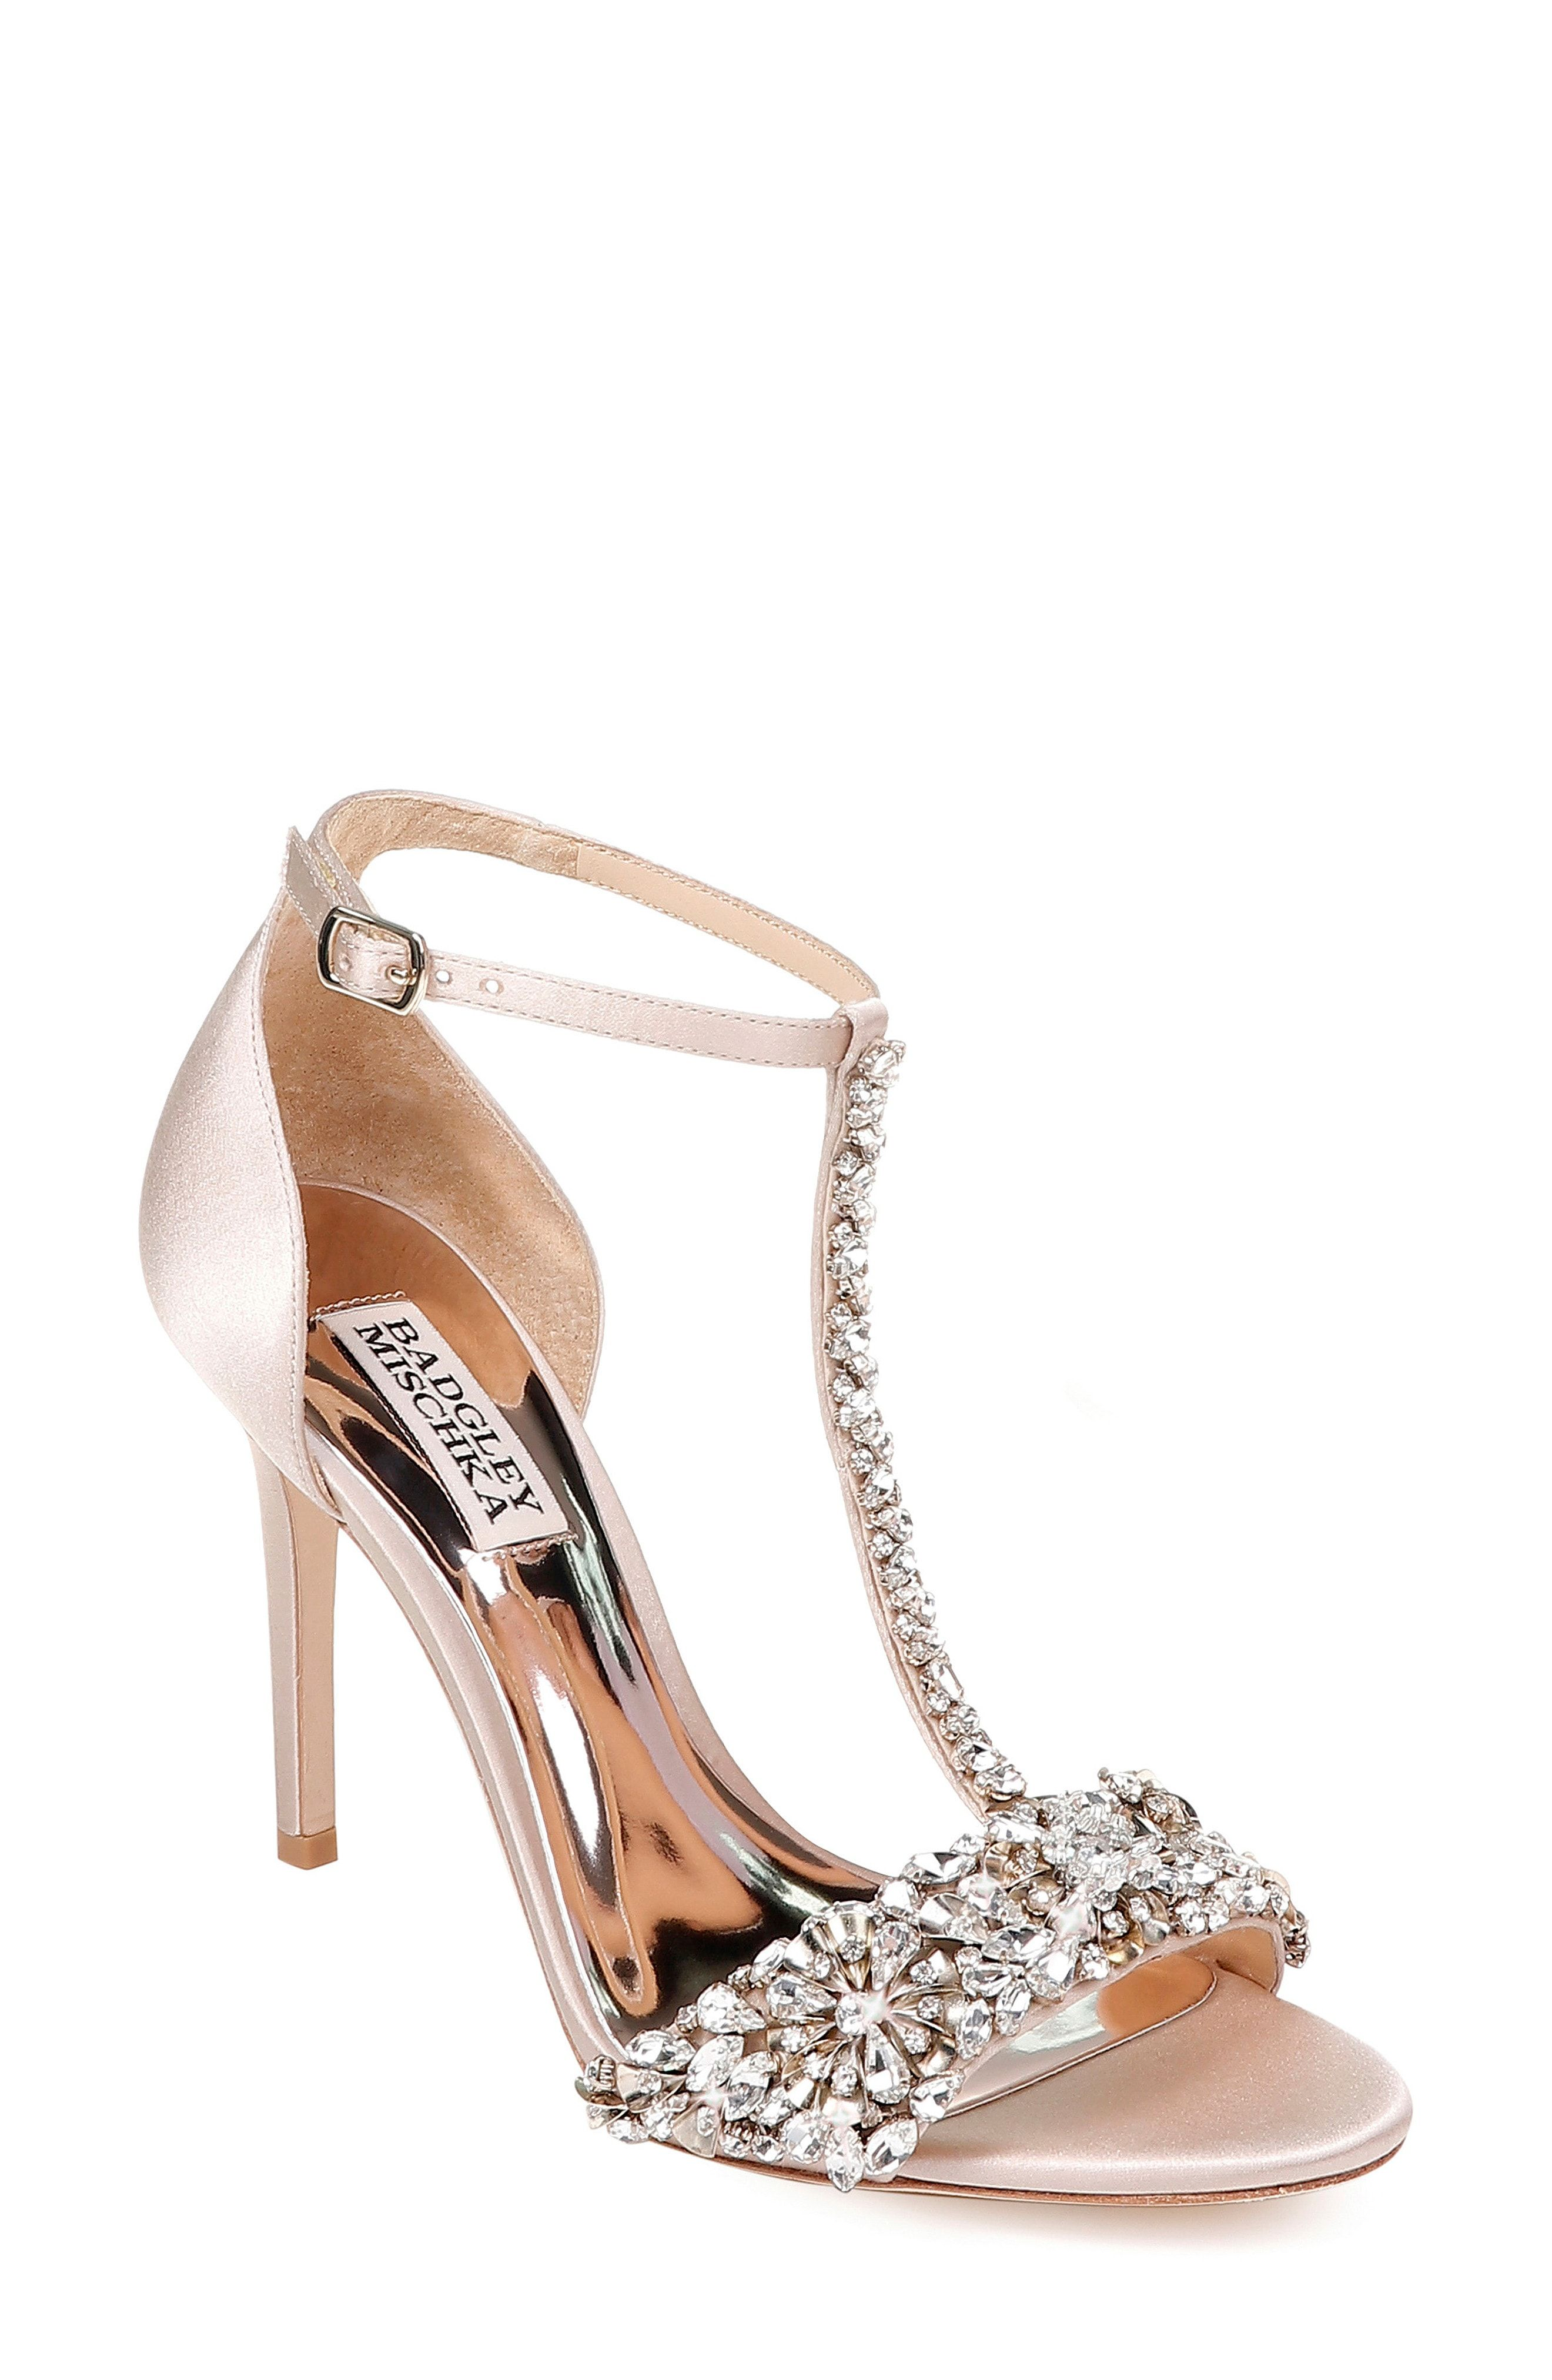 00cfb1db305e Badgley Mischka Crystal Embellished Sandal (Women)